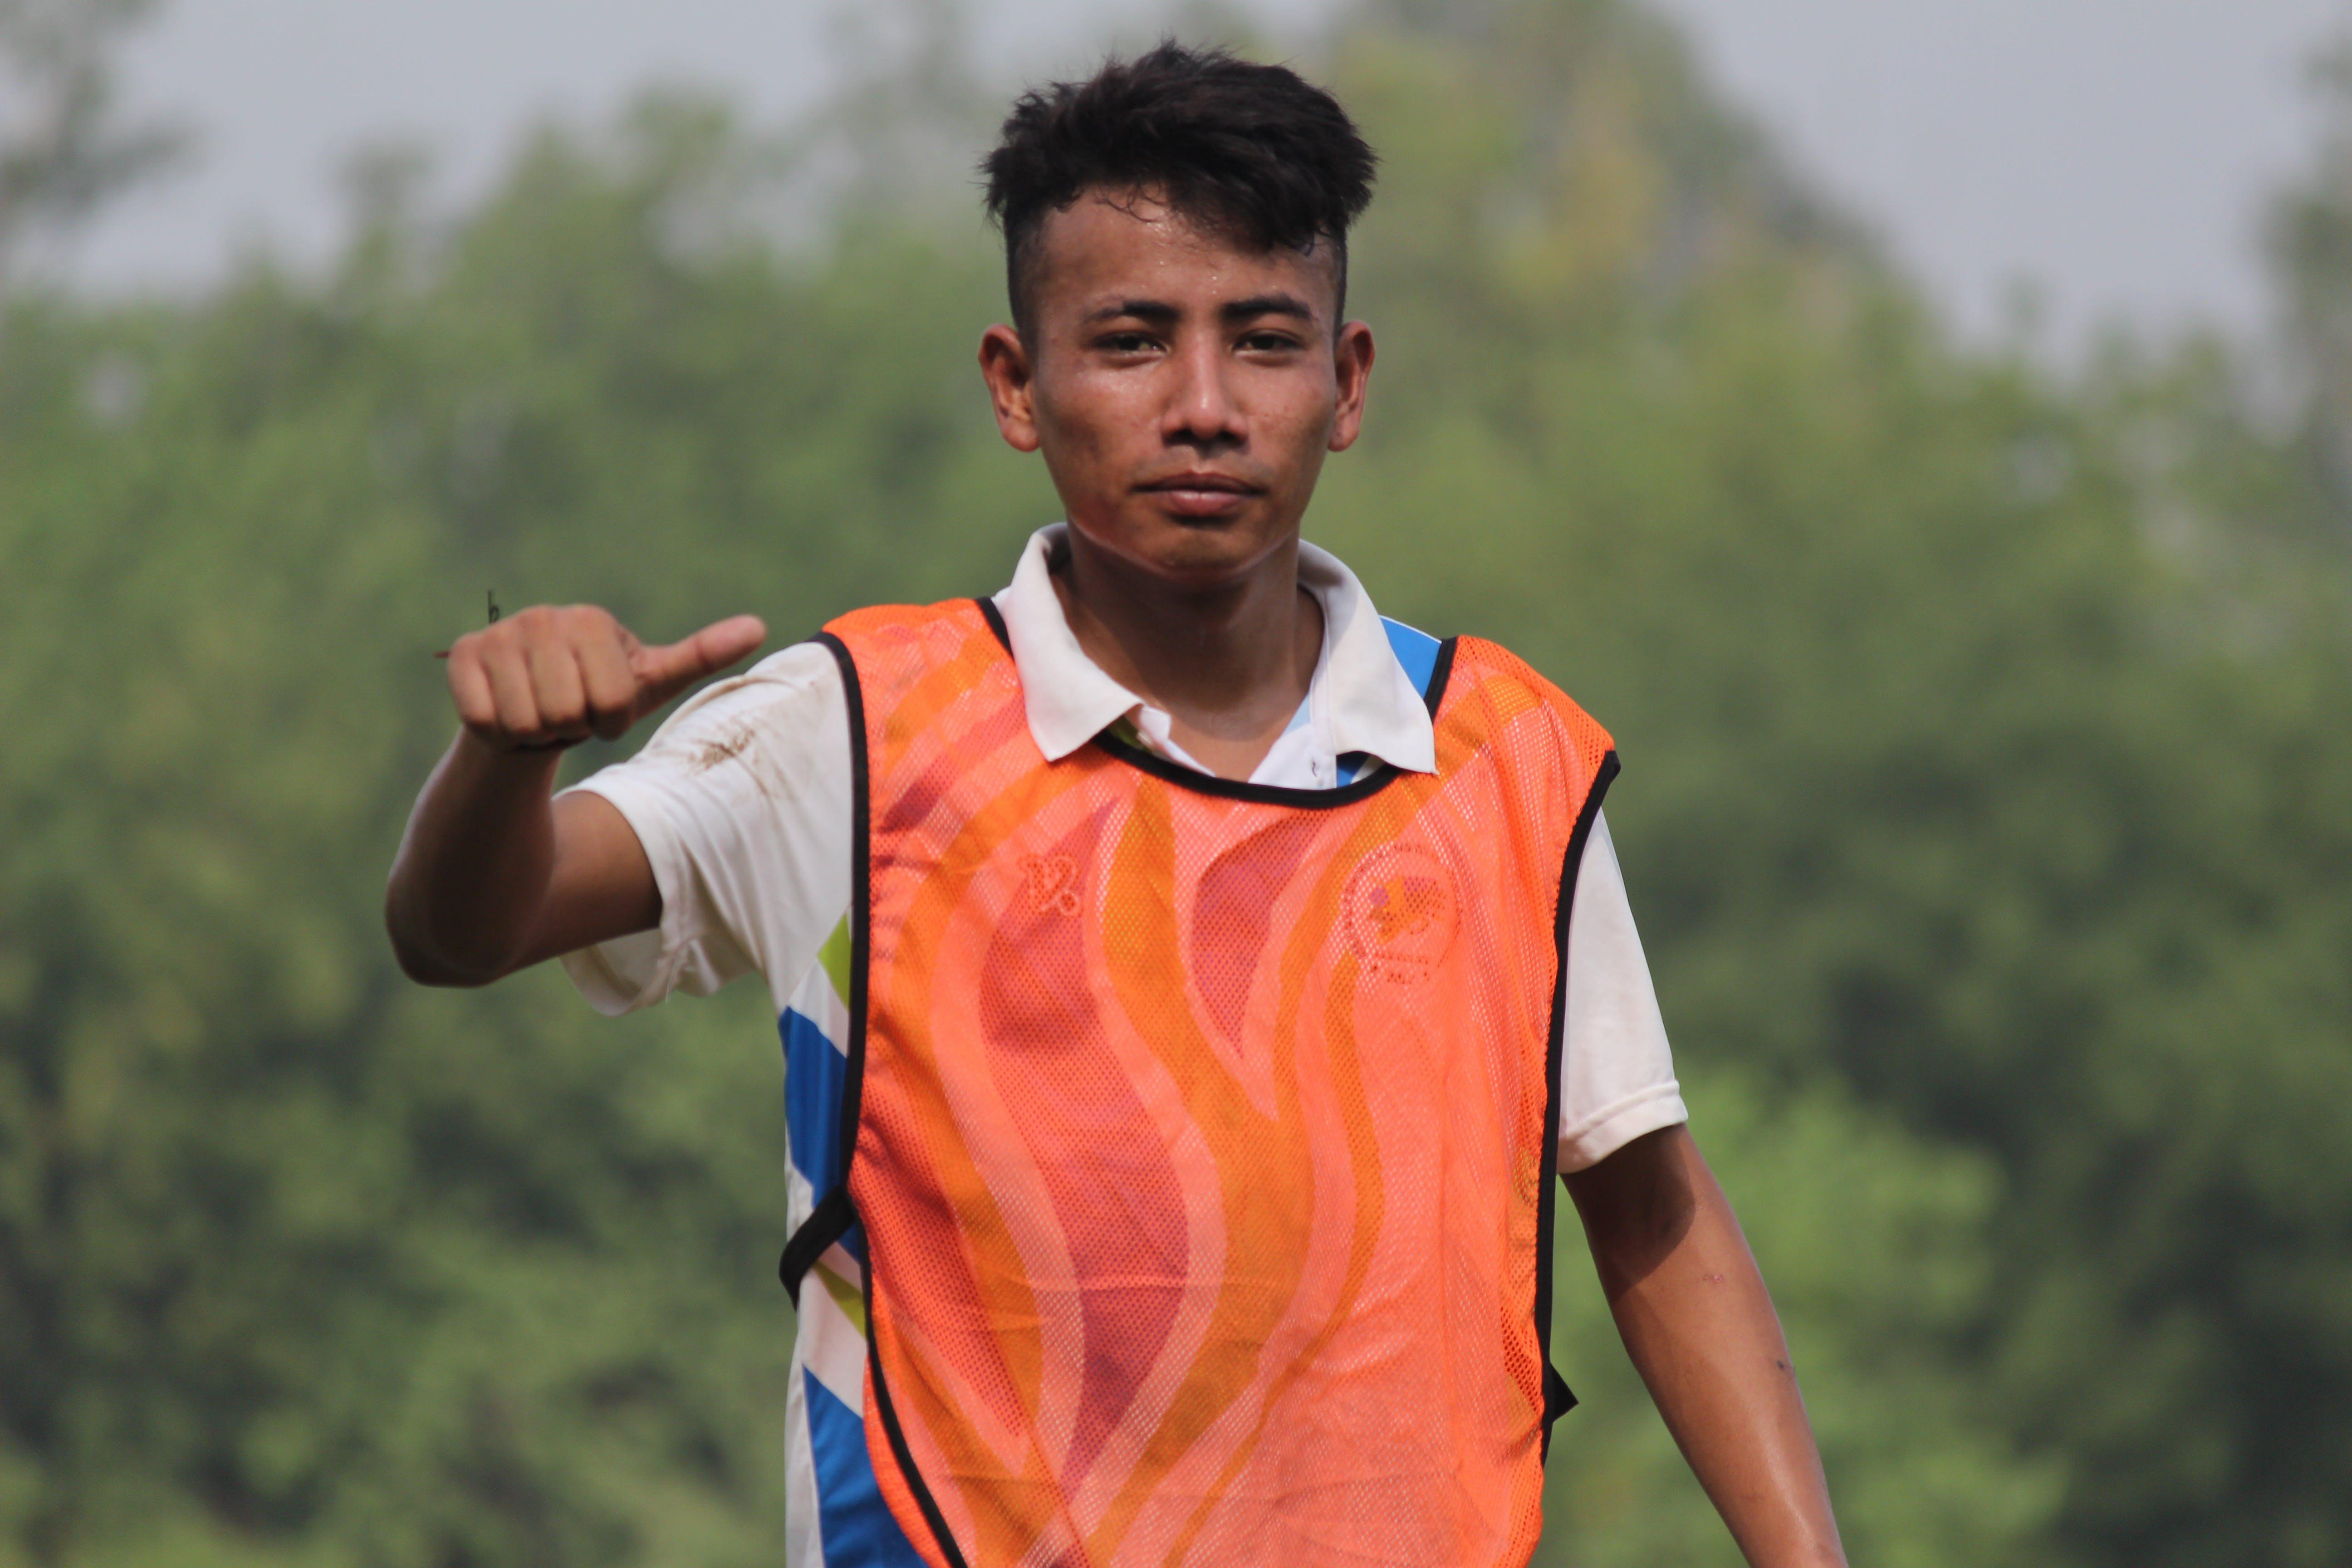 Man In Orange And White Shirt